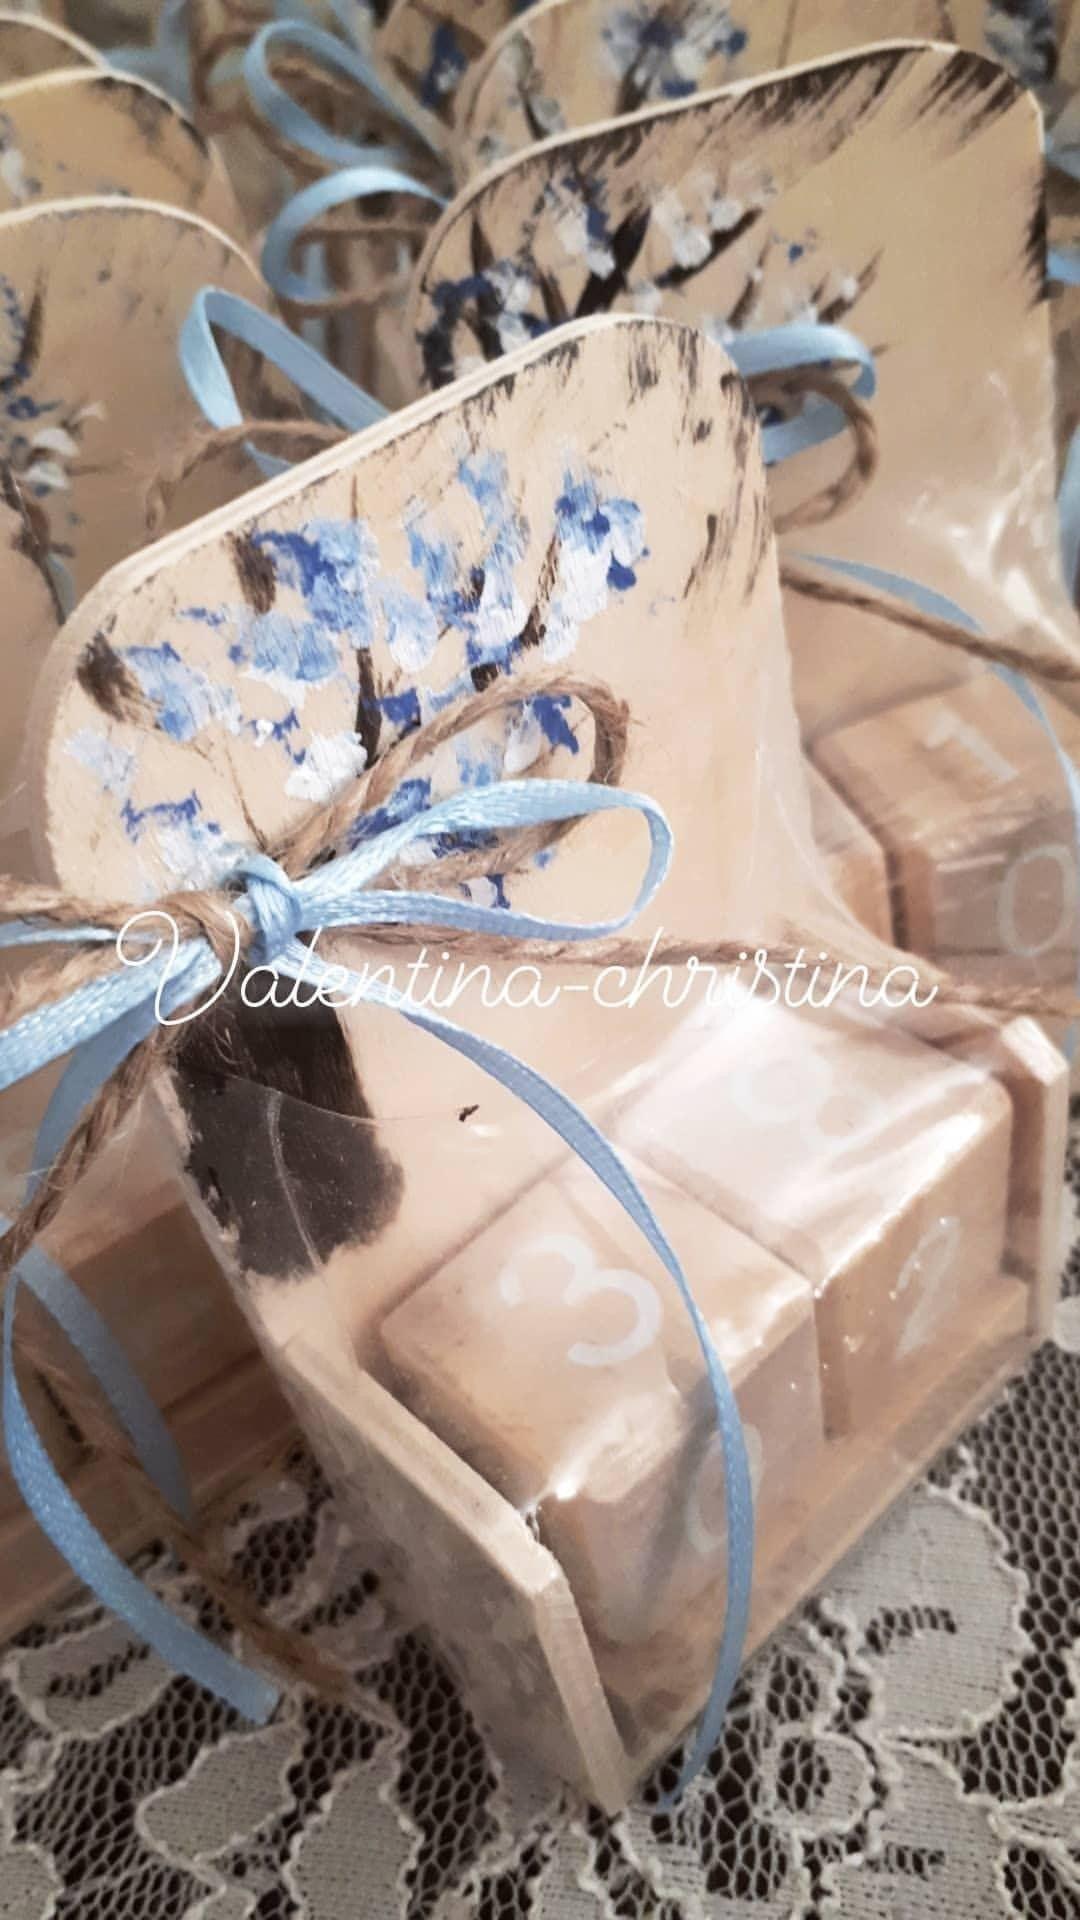 c960afdd5917 Όταν η τέχνη συναντά την δημιουργία μπομπονιέρας!!!!ξύλινο ημερολόγιο με  δέντρο της ζωής by valentina-christina handmade products 2105157506